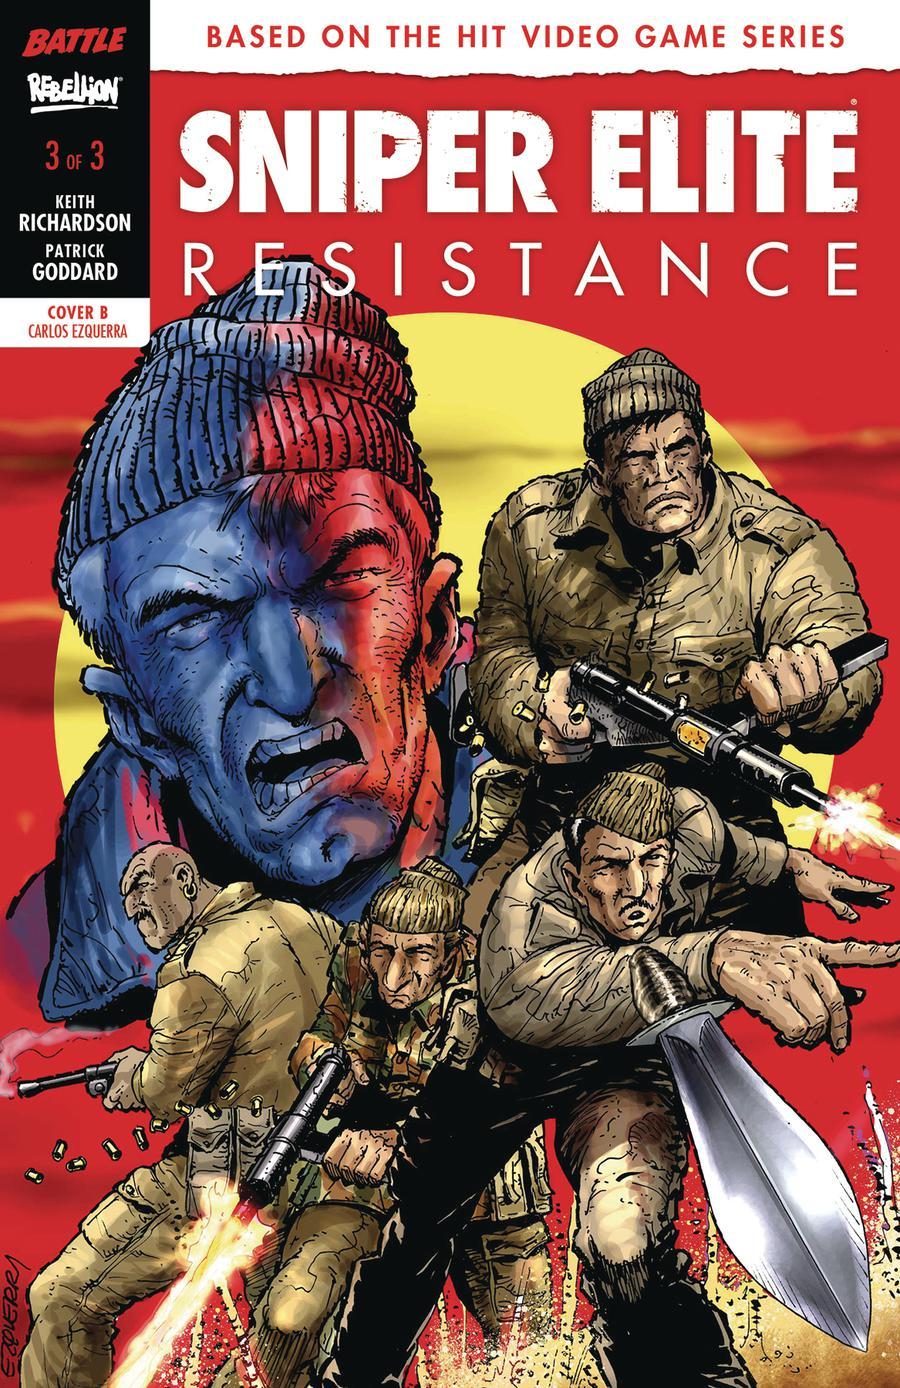 Sniper Elite Resistance #3 Cover B Variant Carlos Ezquerra Cover